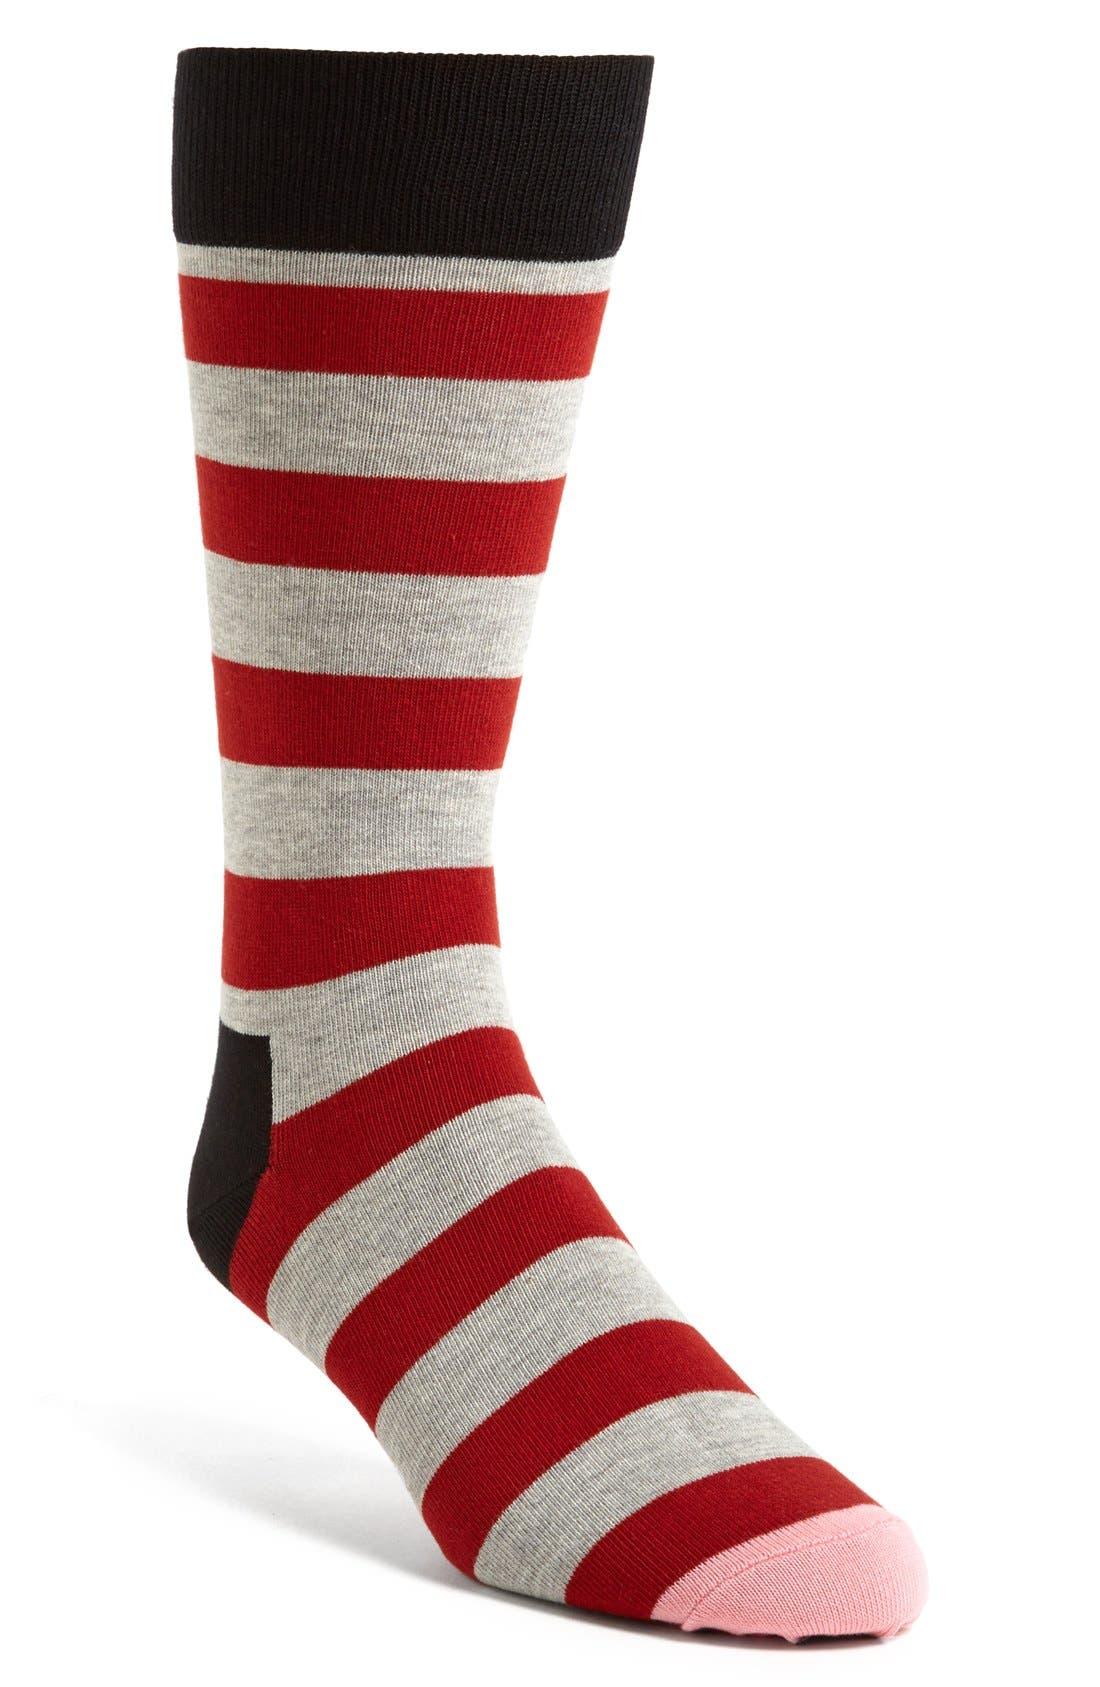 Alternate Image 1 Selected - Happy Socks Patterned Socks